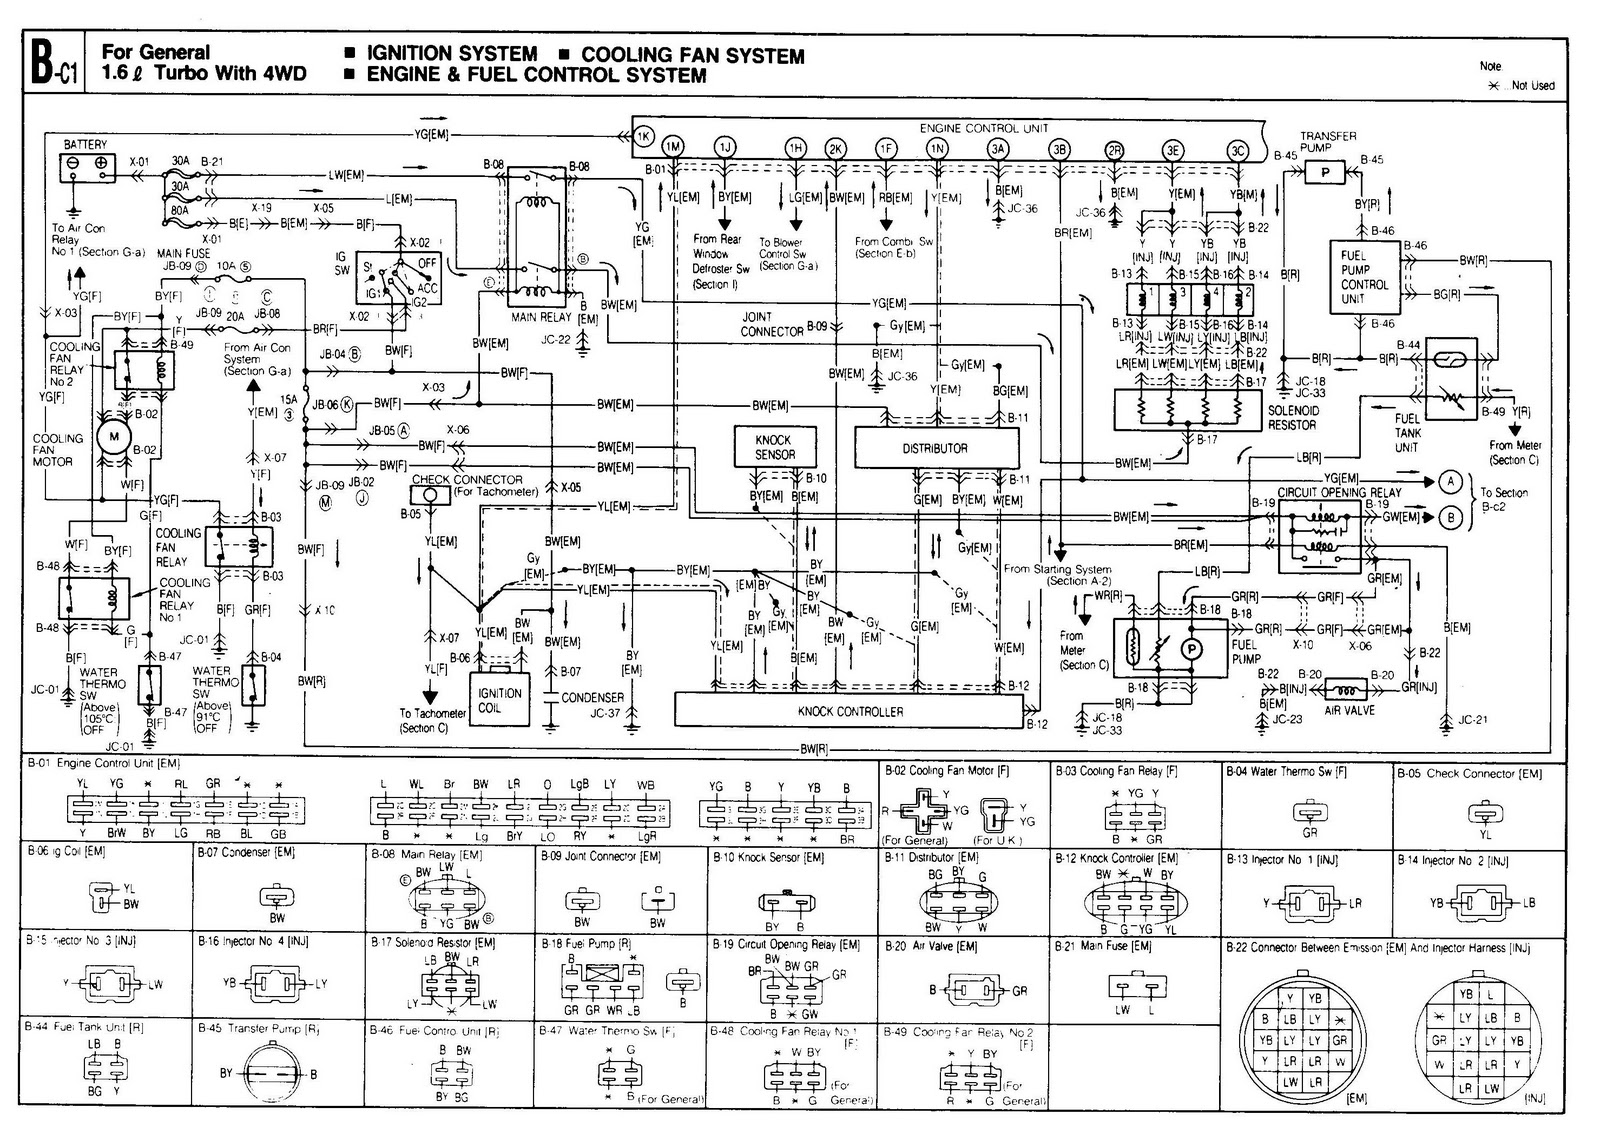 mazda 626 wiring diagrams private sharing about wiring diagram u2022 rh caraccessoriesandsoftware co uk mazda 626 wiring diagram pdf mazda 626 distributor wiring diagram